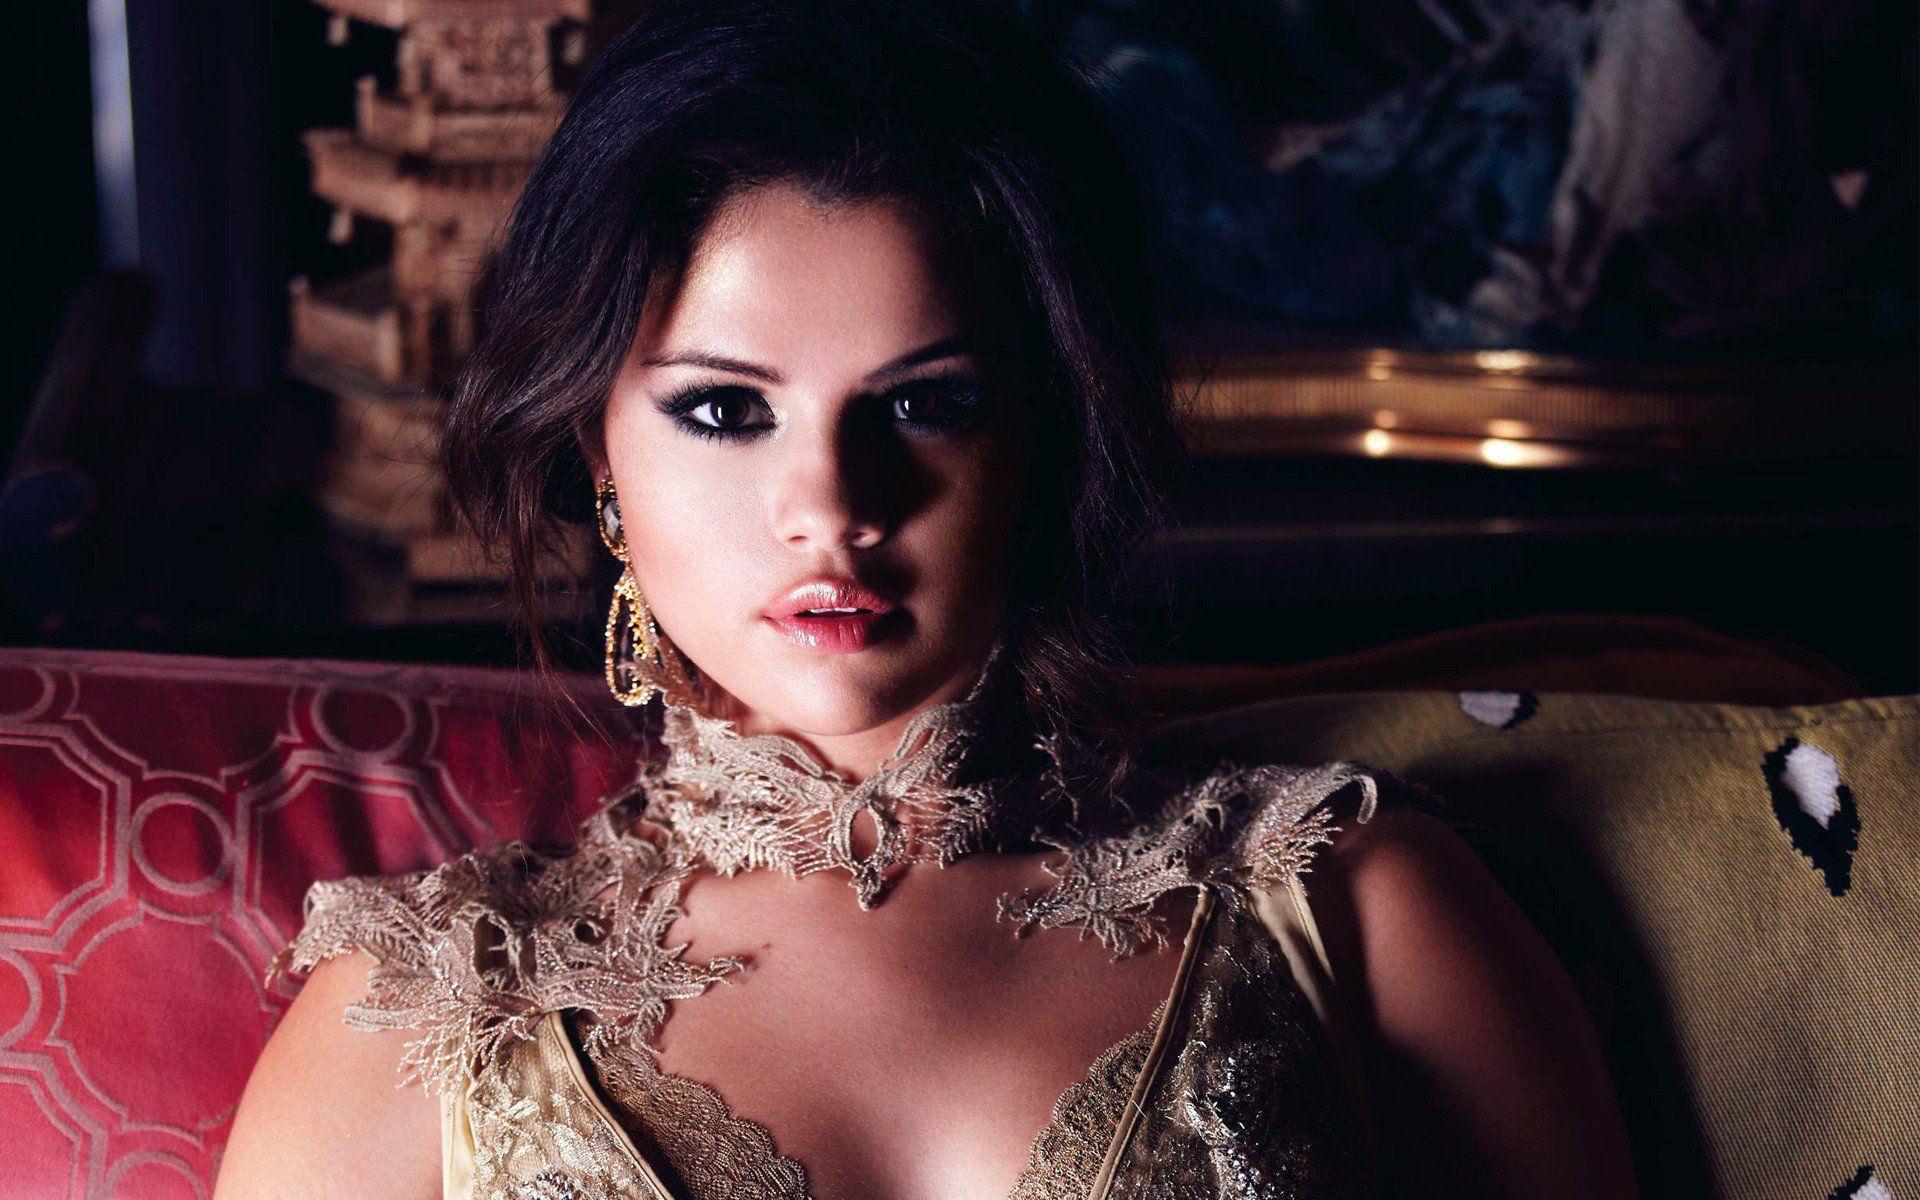 Selena Gomez HD Wallpaper | Celebrities HD Wallpapers